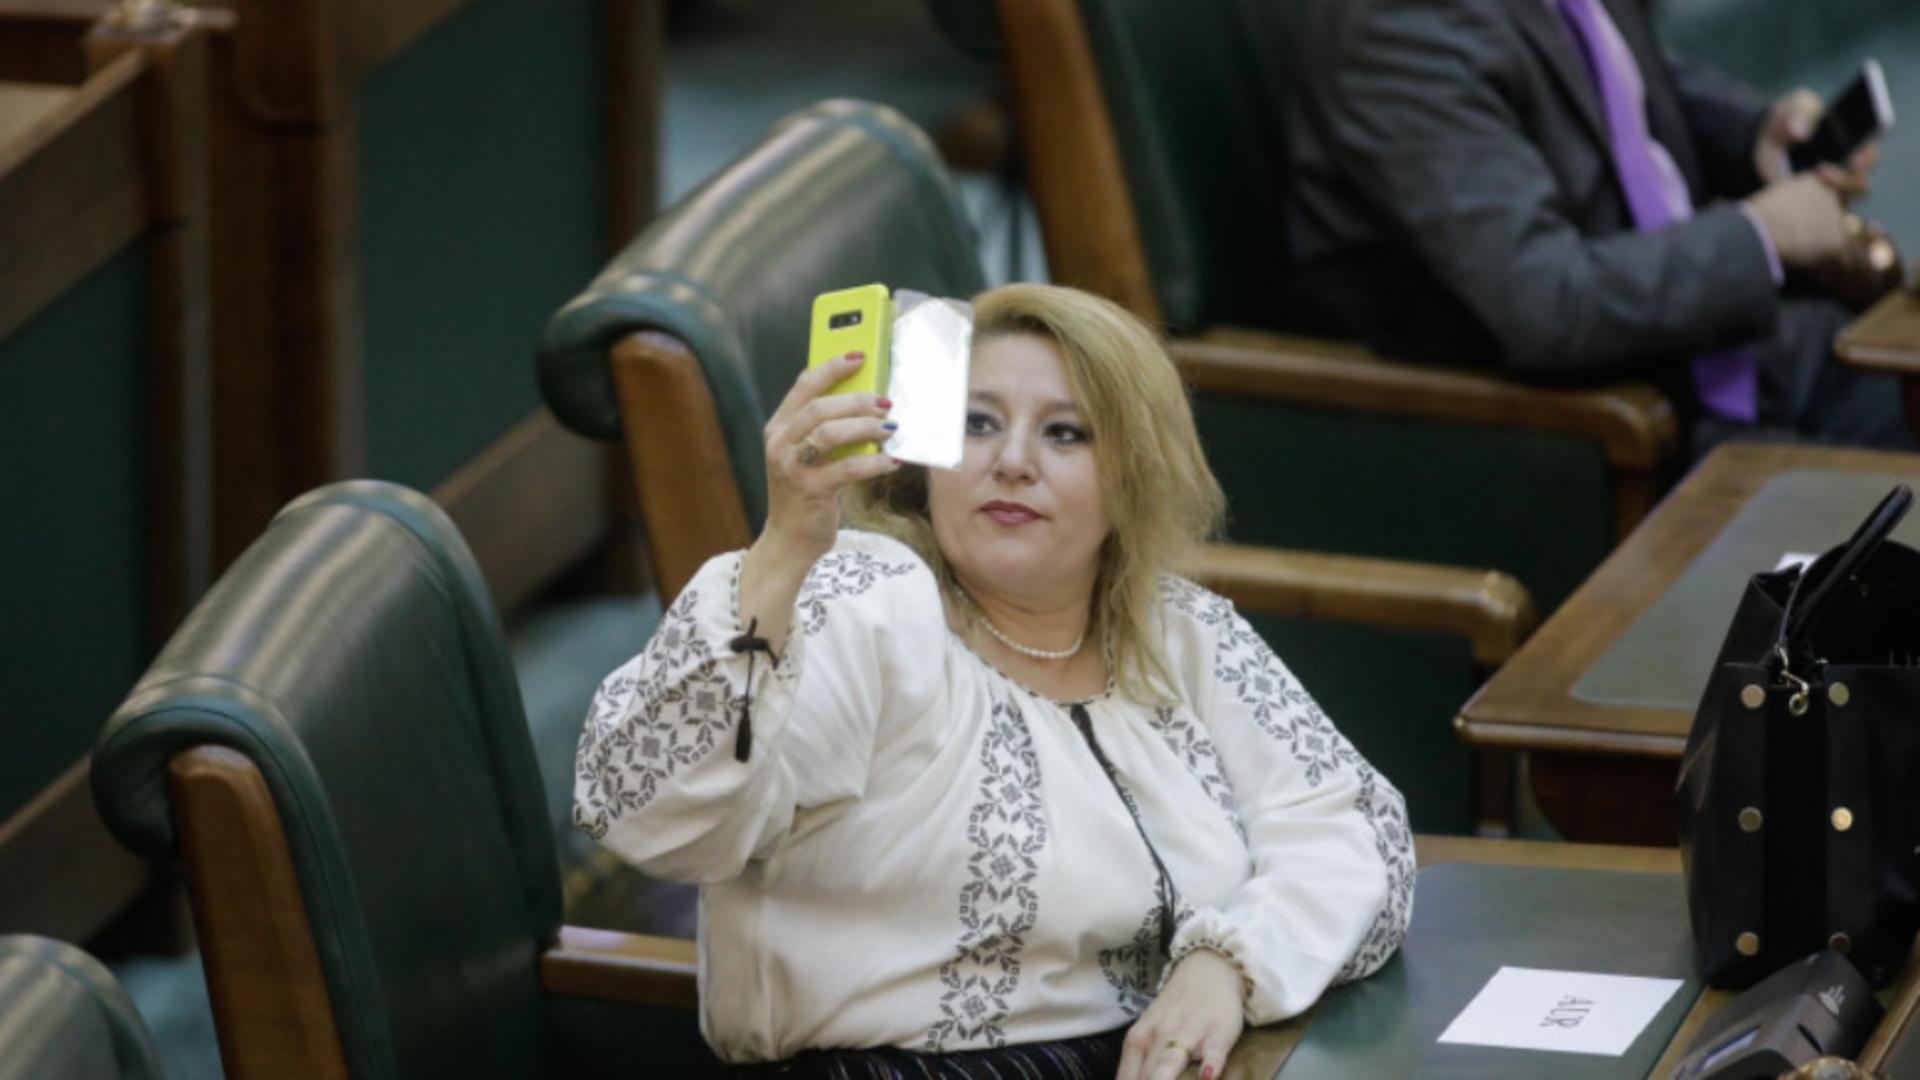 Diana Șoșoacă, senator independent